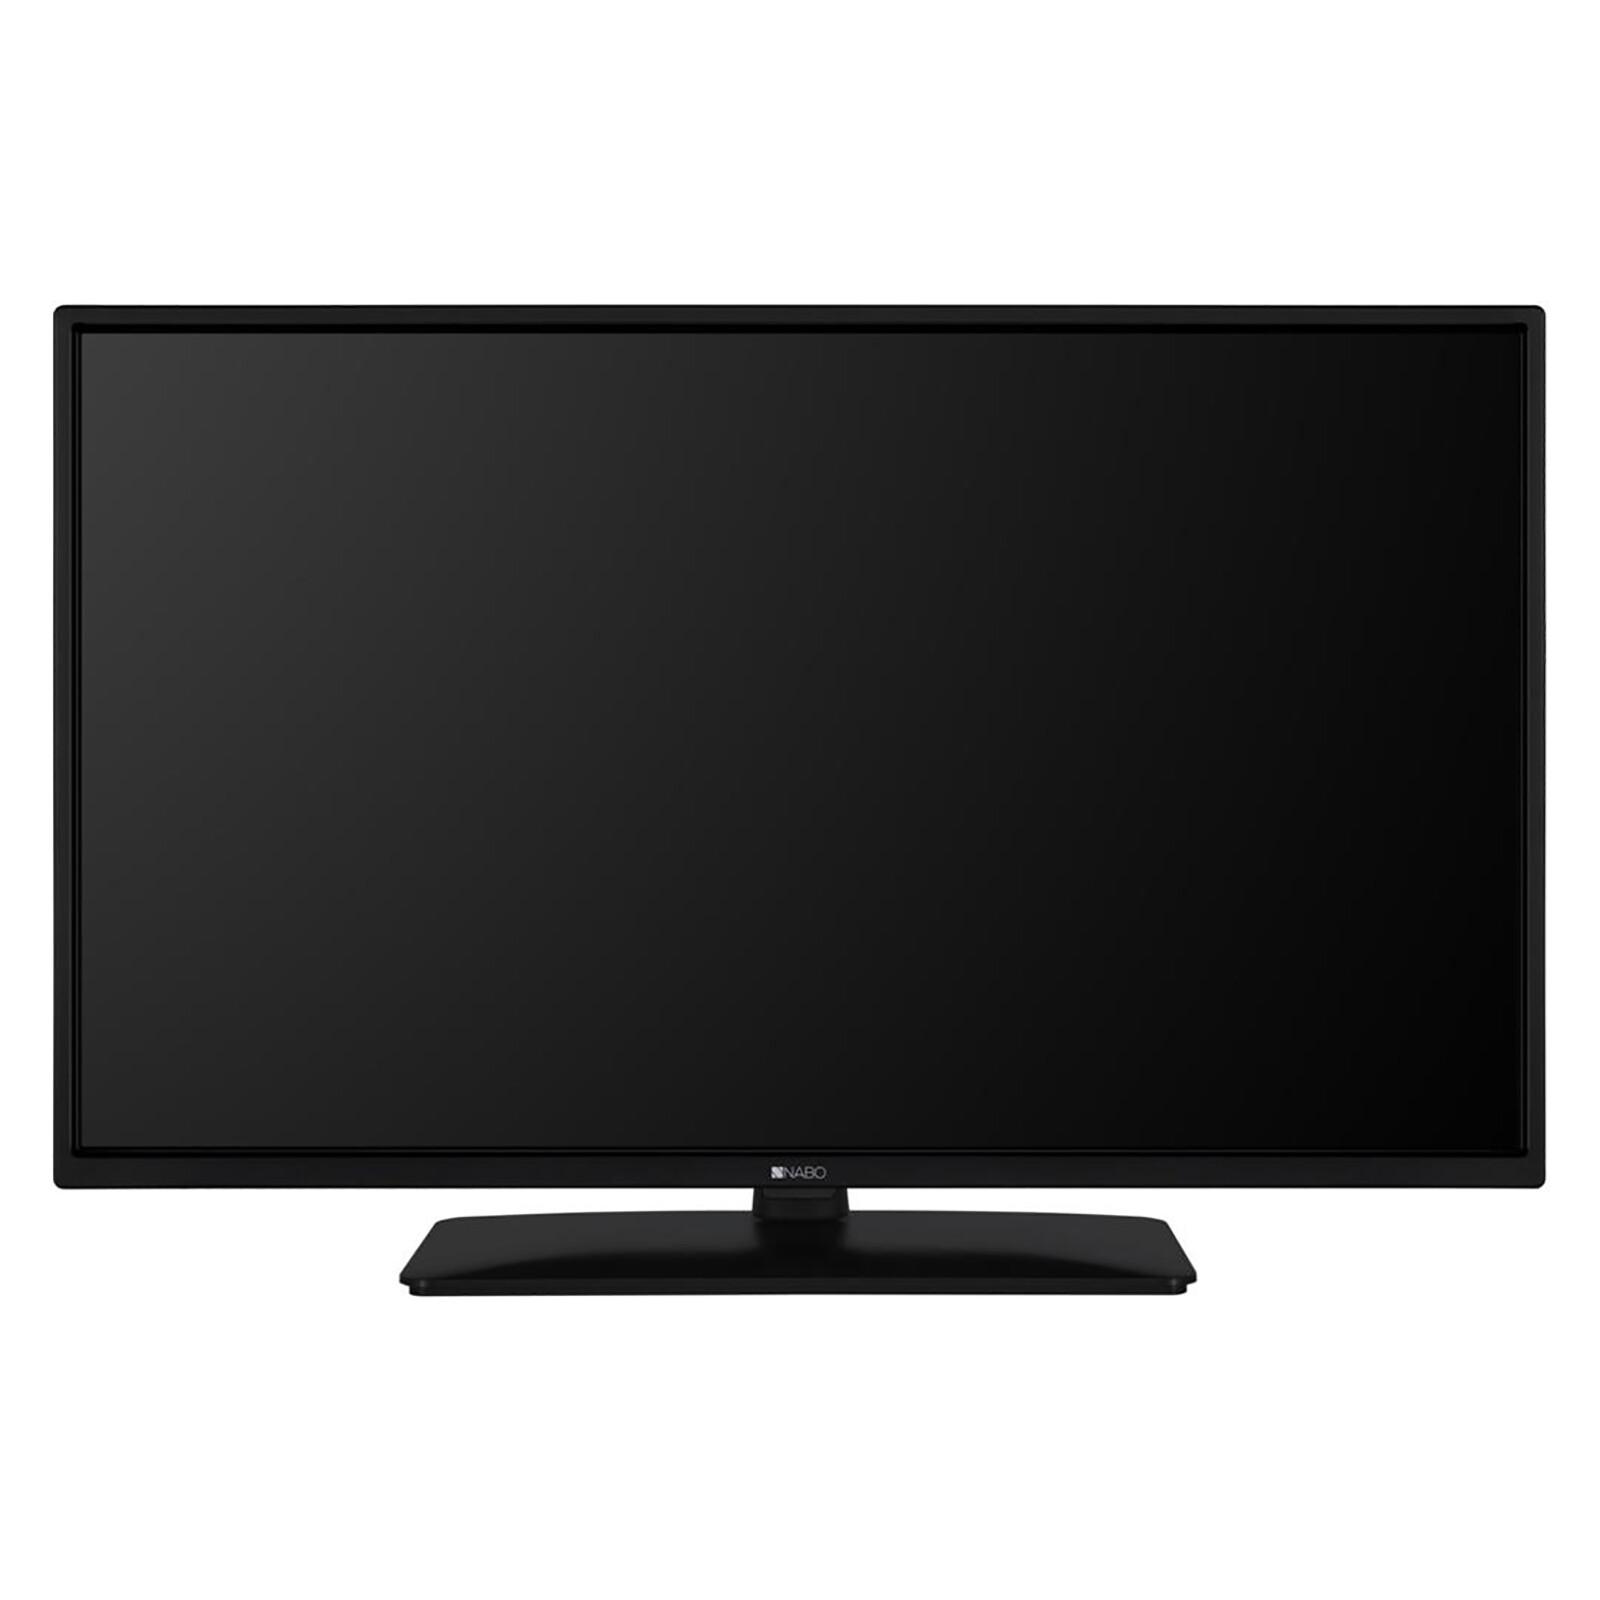 Nabo 32 LV4320 32 Zoll HD-Ready LED TV